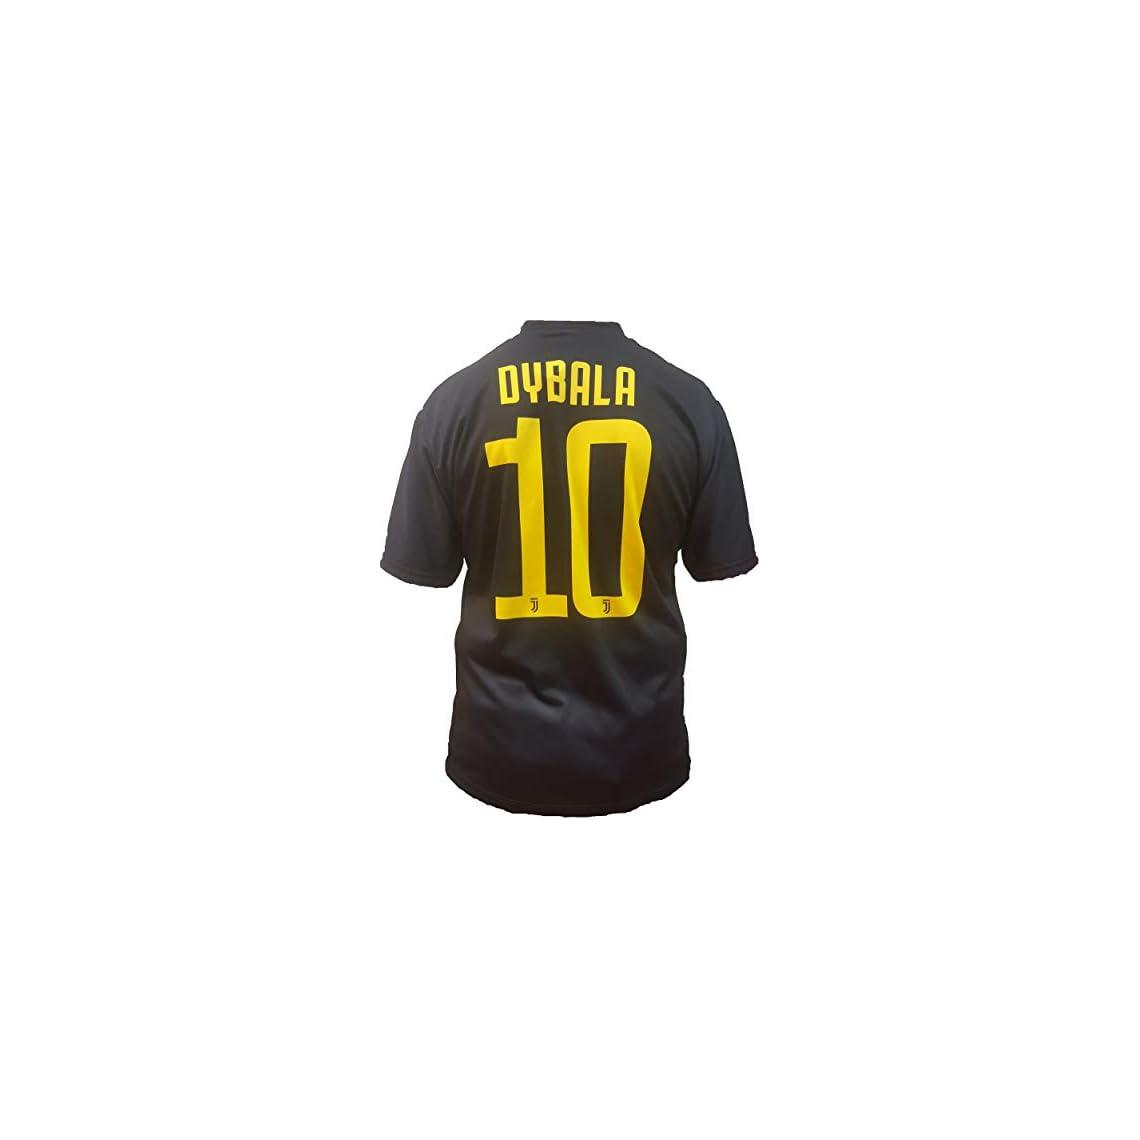 251c959ca Camiseta de Fútbol Paulo Dybala 10 Juventus Tercera Camisa Negra Temporada  2018-2019 Replica Oficial